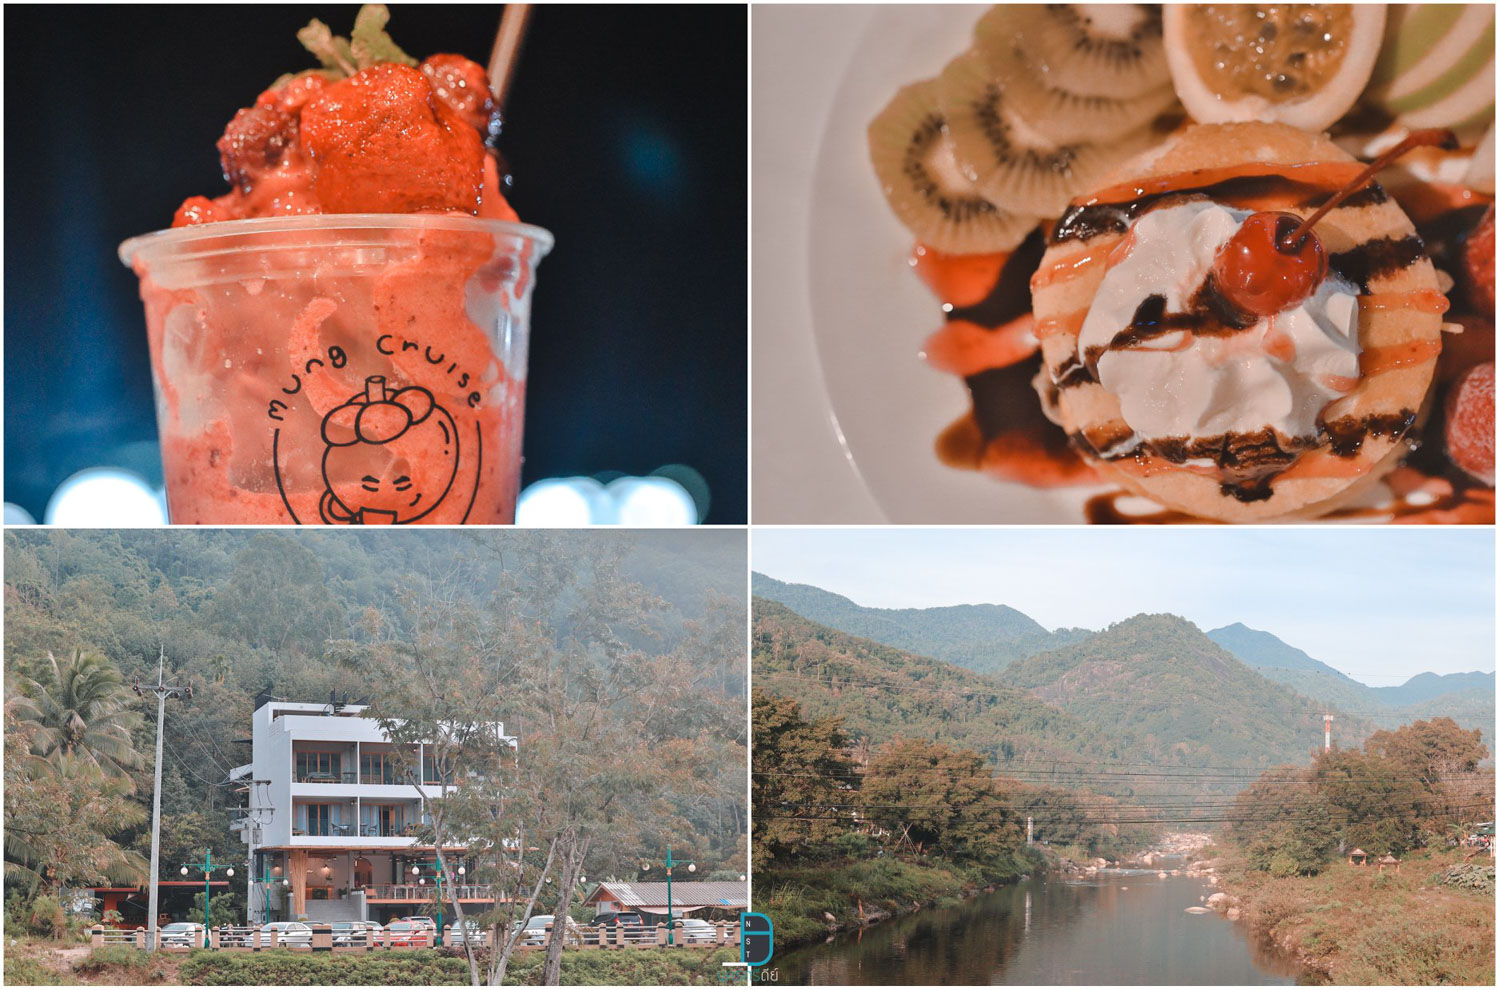 6.-Mung-Cruise-Cafe-คีรีวง คลิกที่นี่ คาเฟ่,Cafe,นครศรีธรรมราช,2020,2563,ของกิน,จุดเช็คอิน,จุดถ่ายรูป